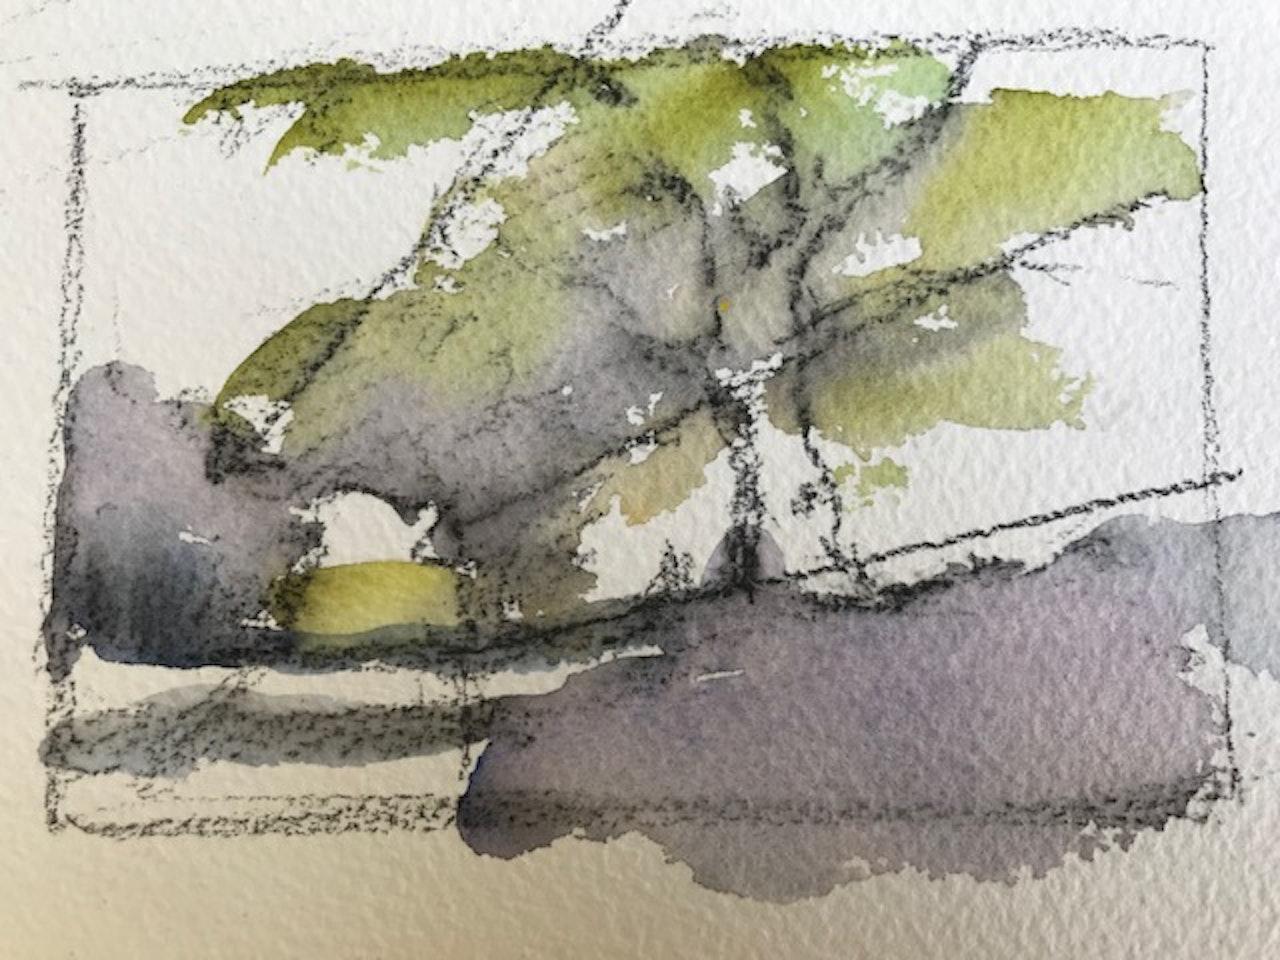 2.Wycwhood tree thumbnail sketch